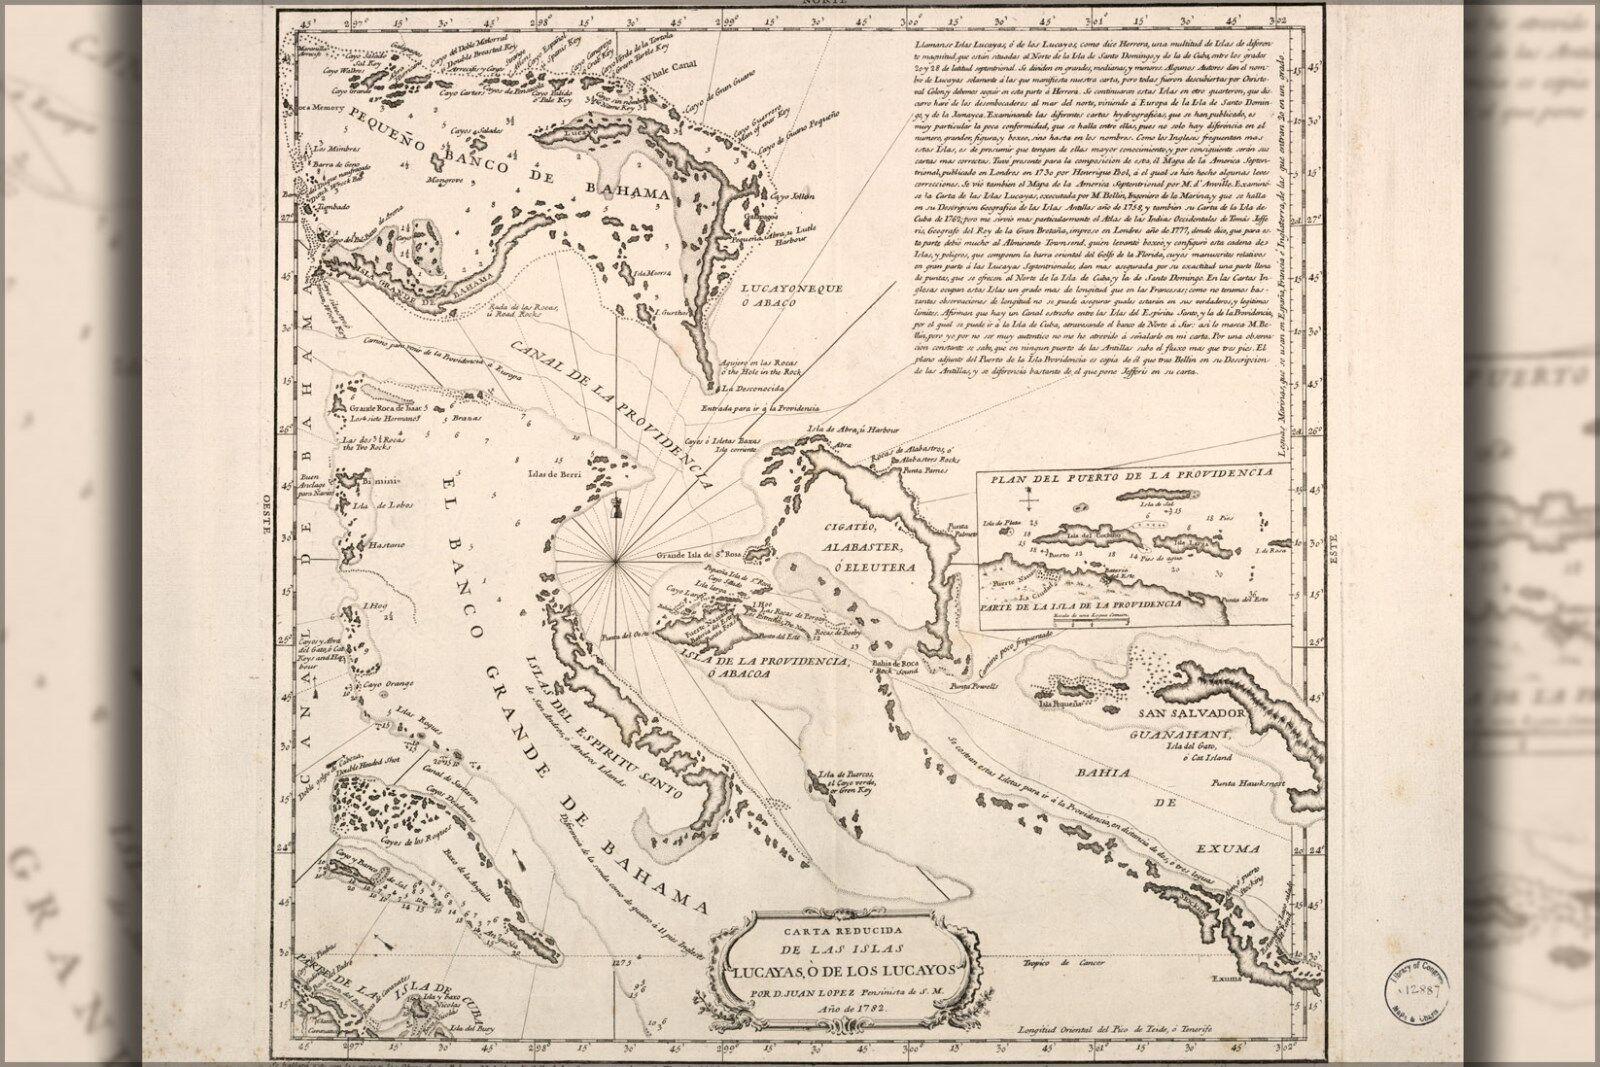 Plakat, Viele Größen; Karte von Bahamas Bahama Inseln